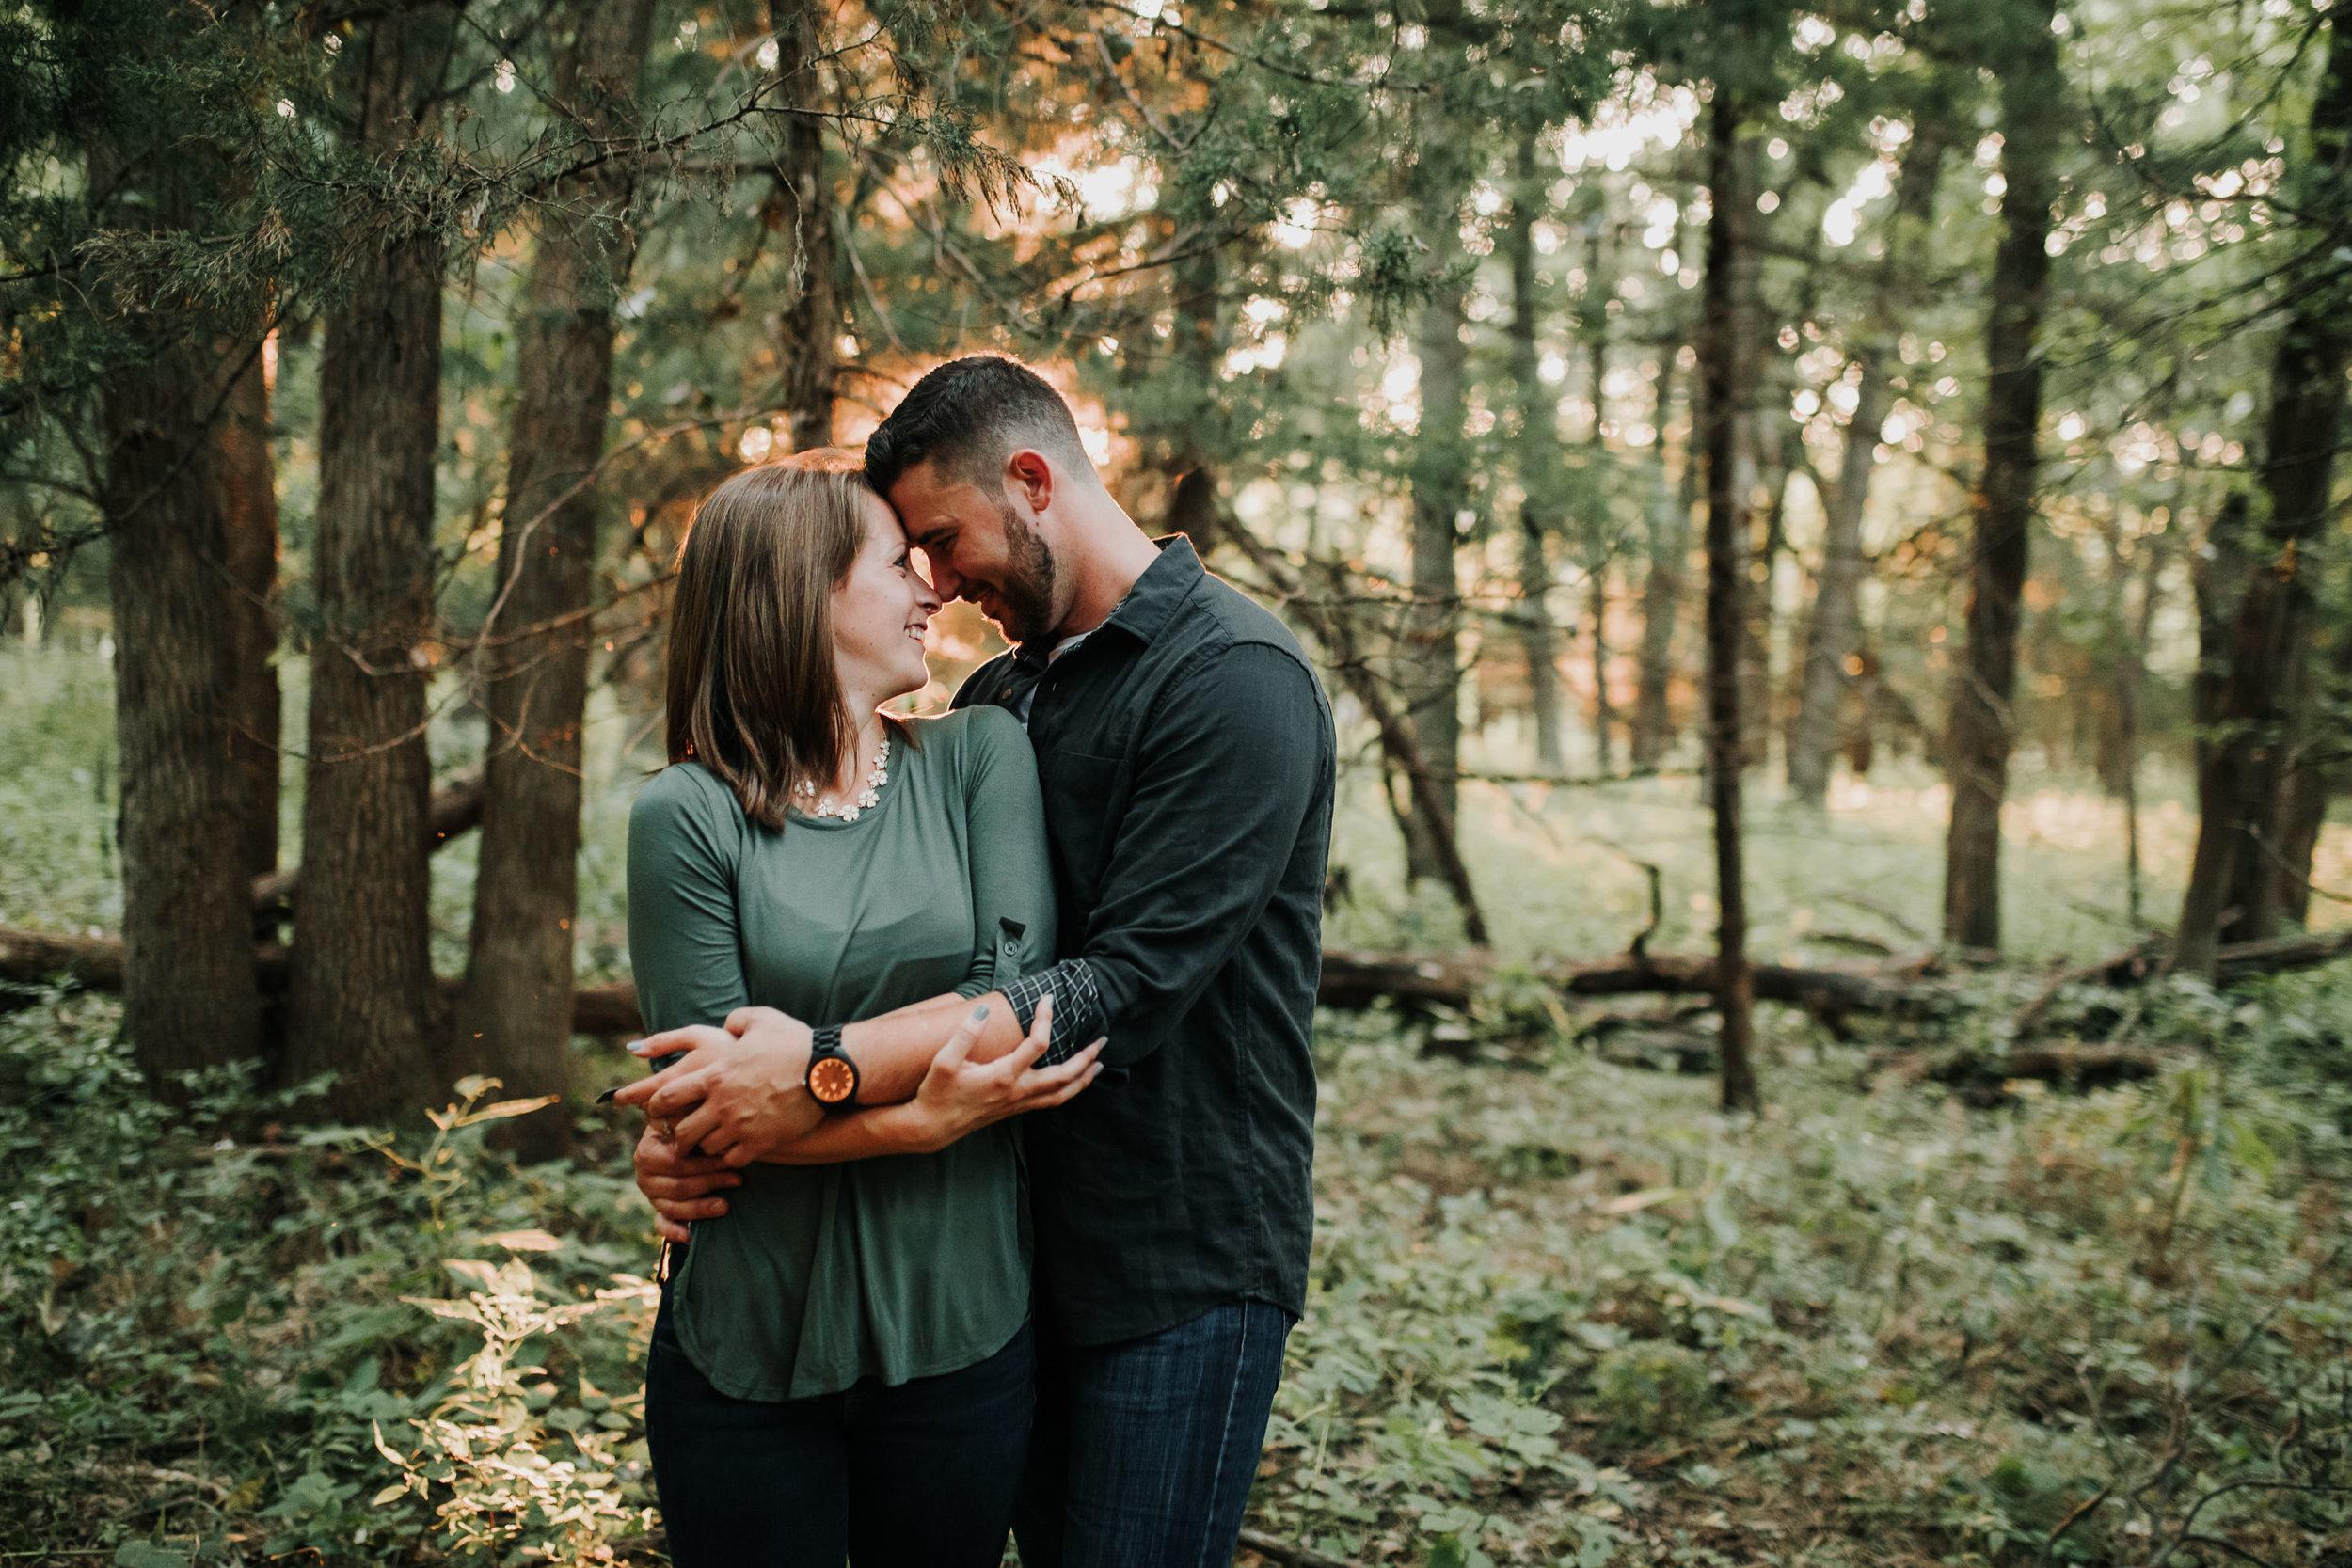 Leslie & Austin - Engaged - Nathaniel Jensen Photography - Omaha Nebraska Wedding Photograper - Engagement Session-84.jpg